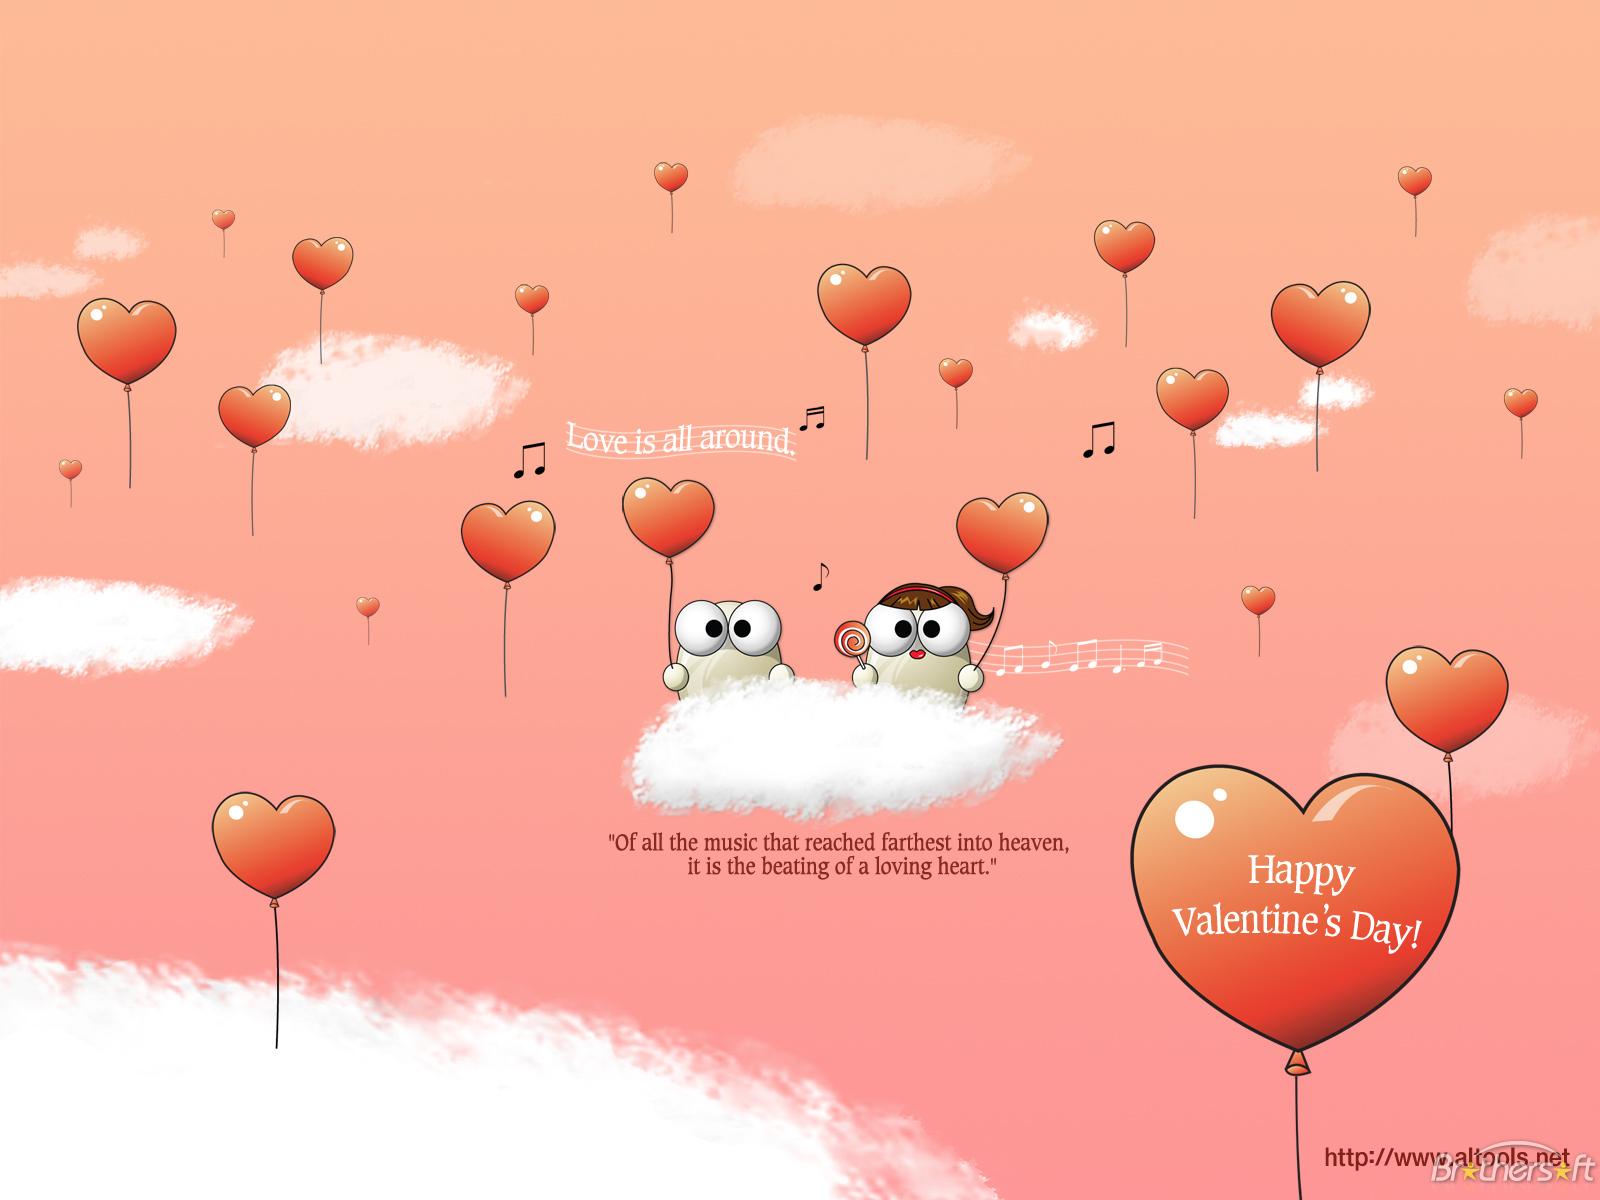 valentines day wallpaper 12 valentines day wallpaper 13 valentines day 1600x1200